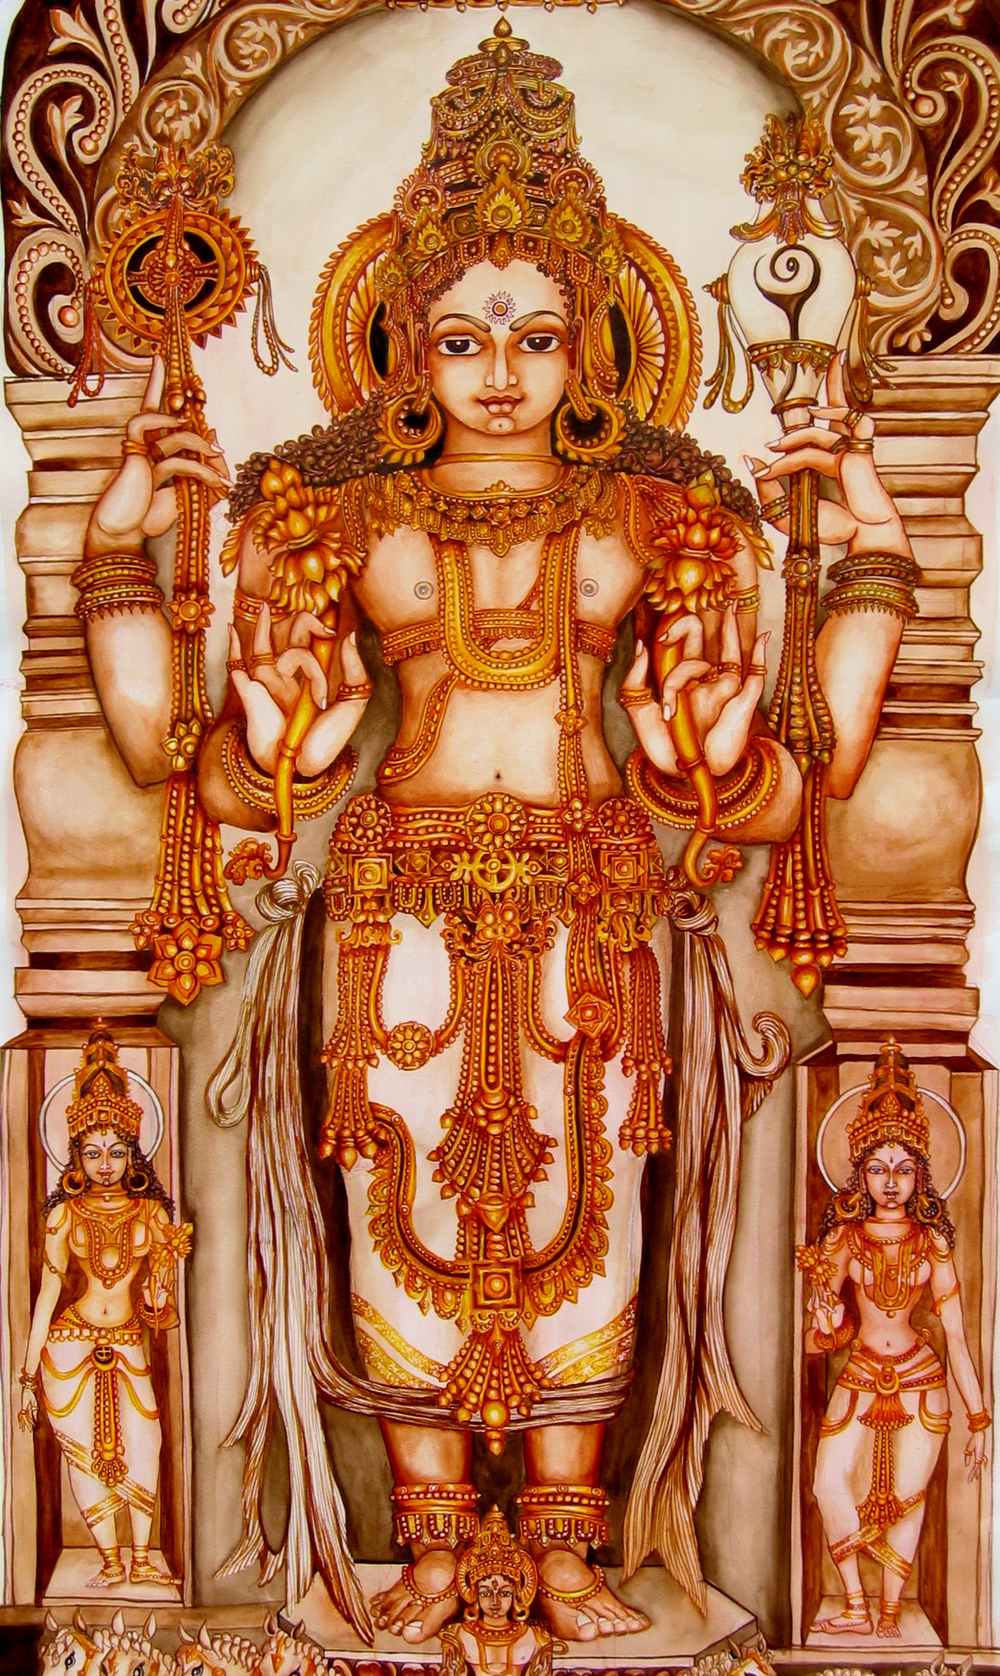 Surya Narayana - Detail